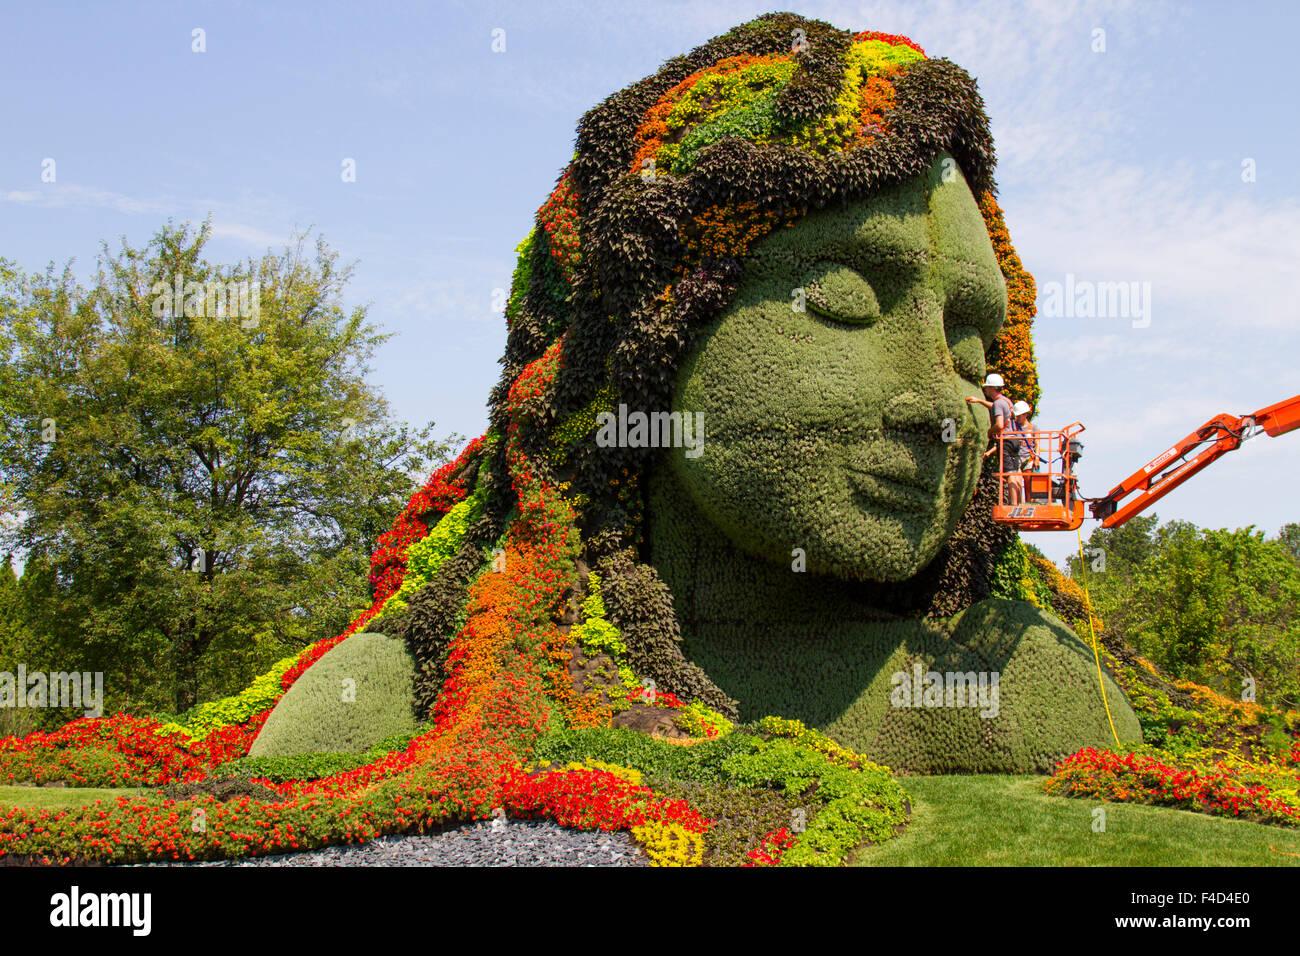 Canada, Montreal, Jardin Botanique (Botanical Garden), Mosaicultures Stock Photo: 88799368 - Alamy